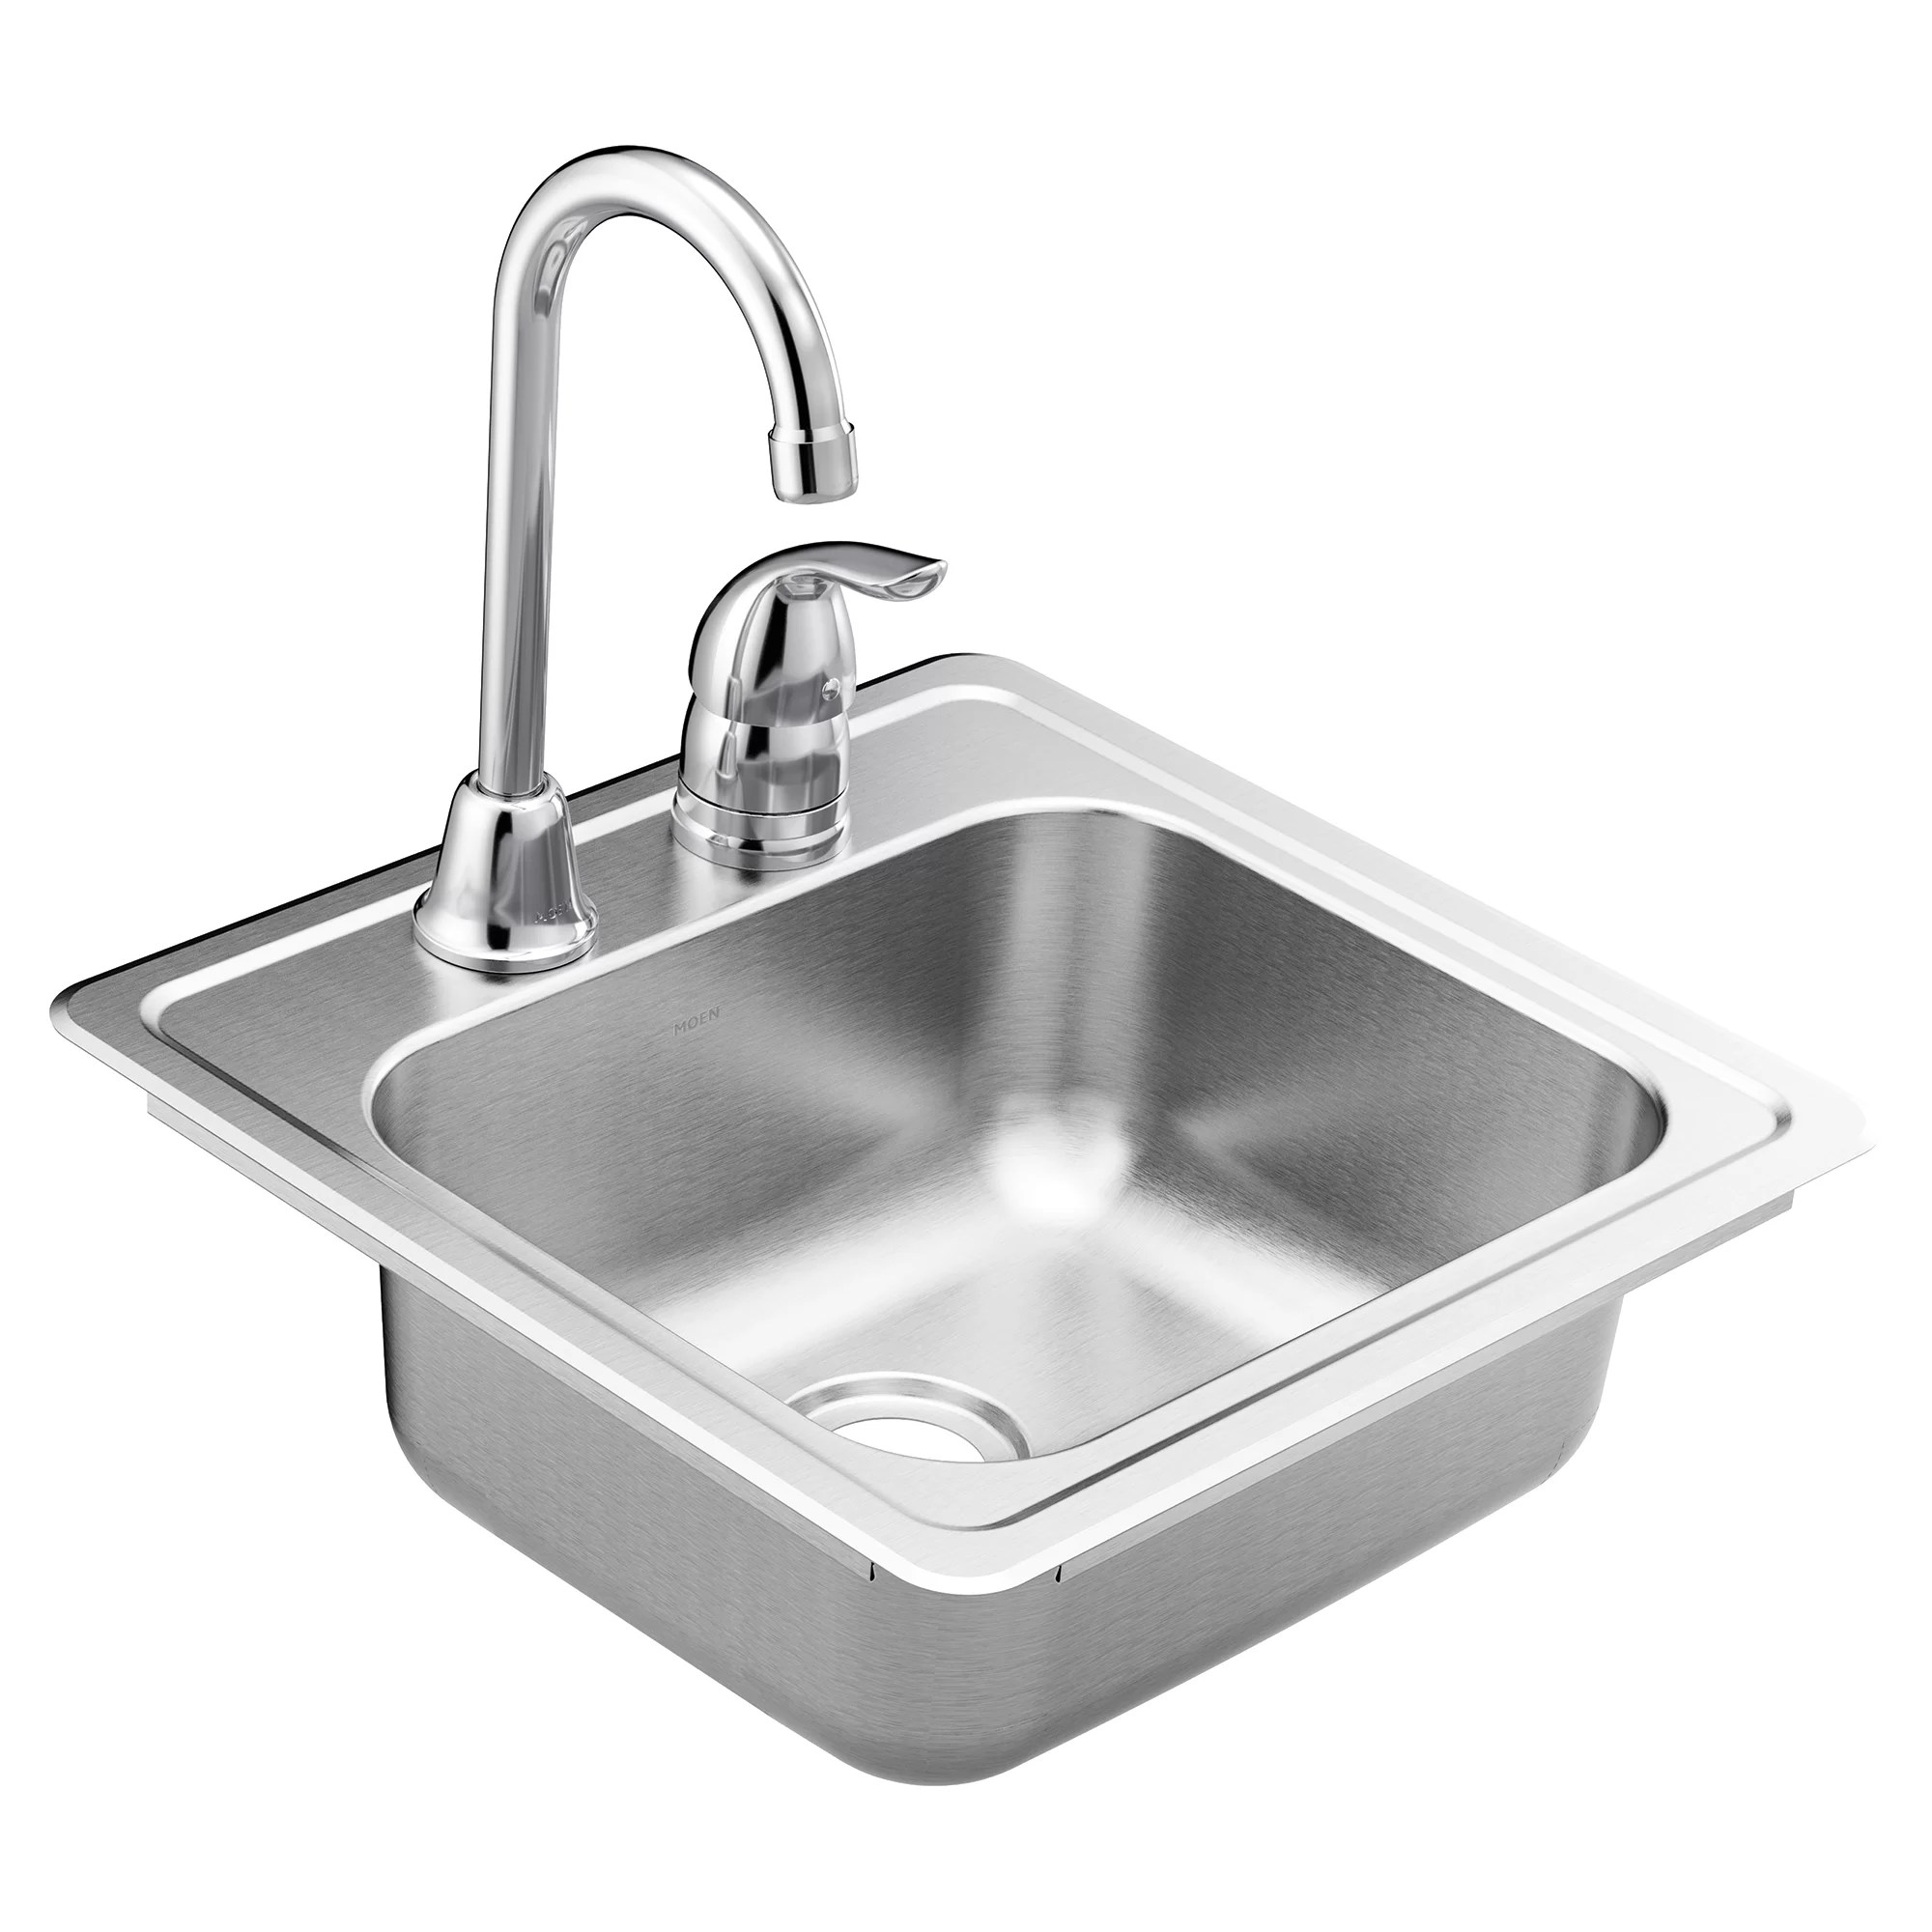 2200 series stainless steel 15 l x 15 w drop in bar sink